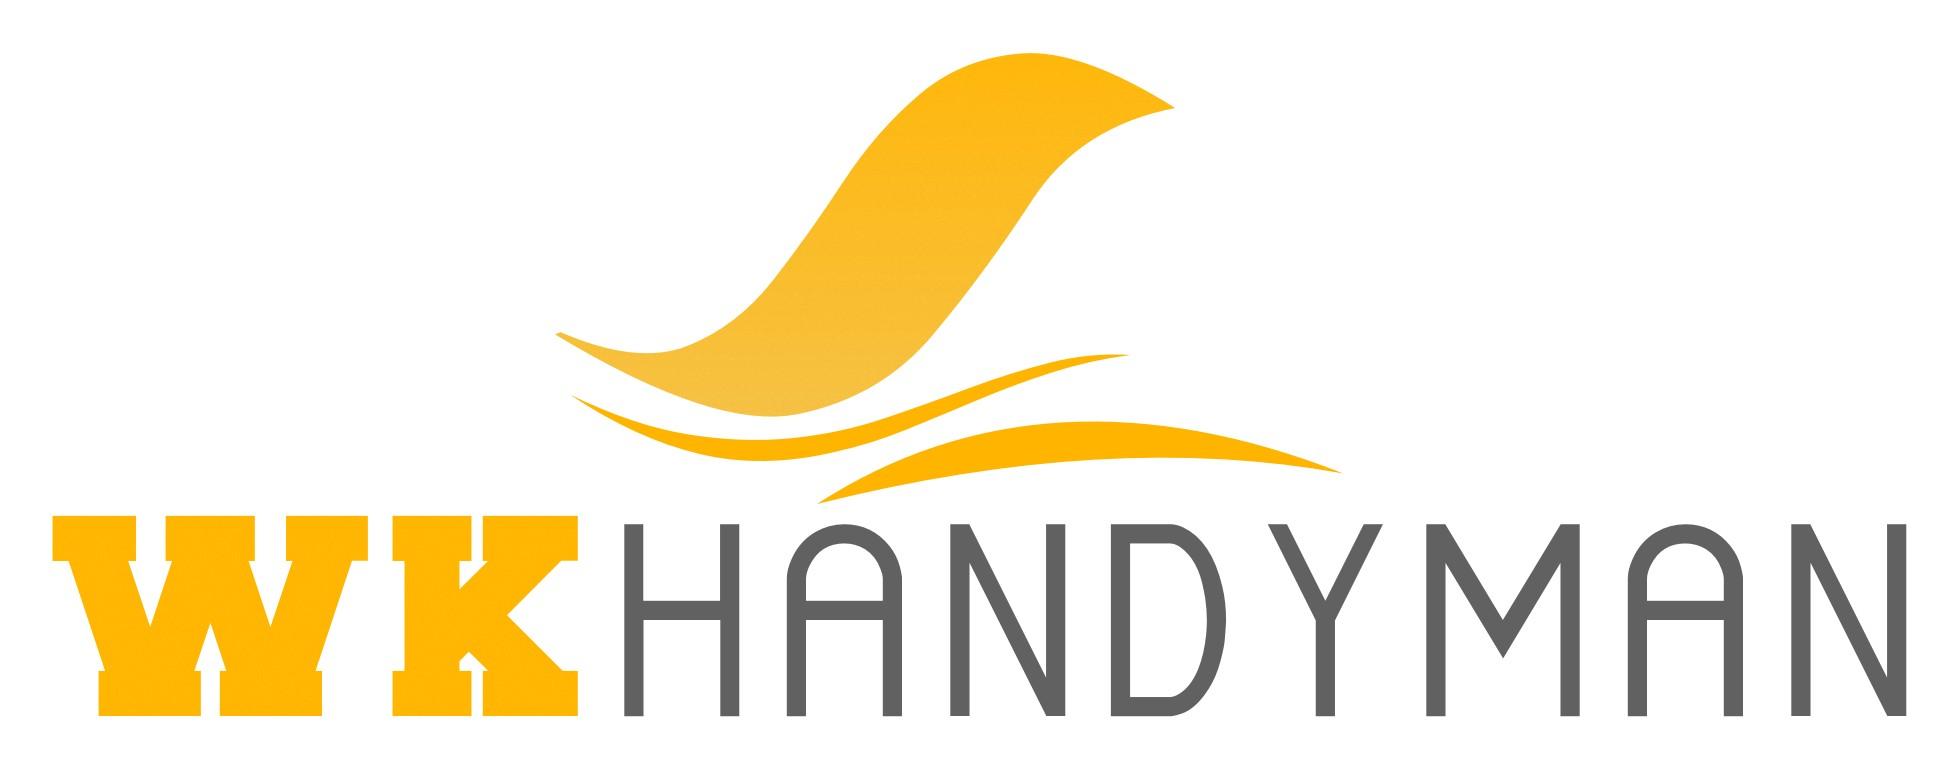 WK handyman logo1